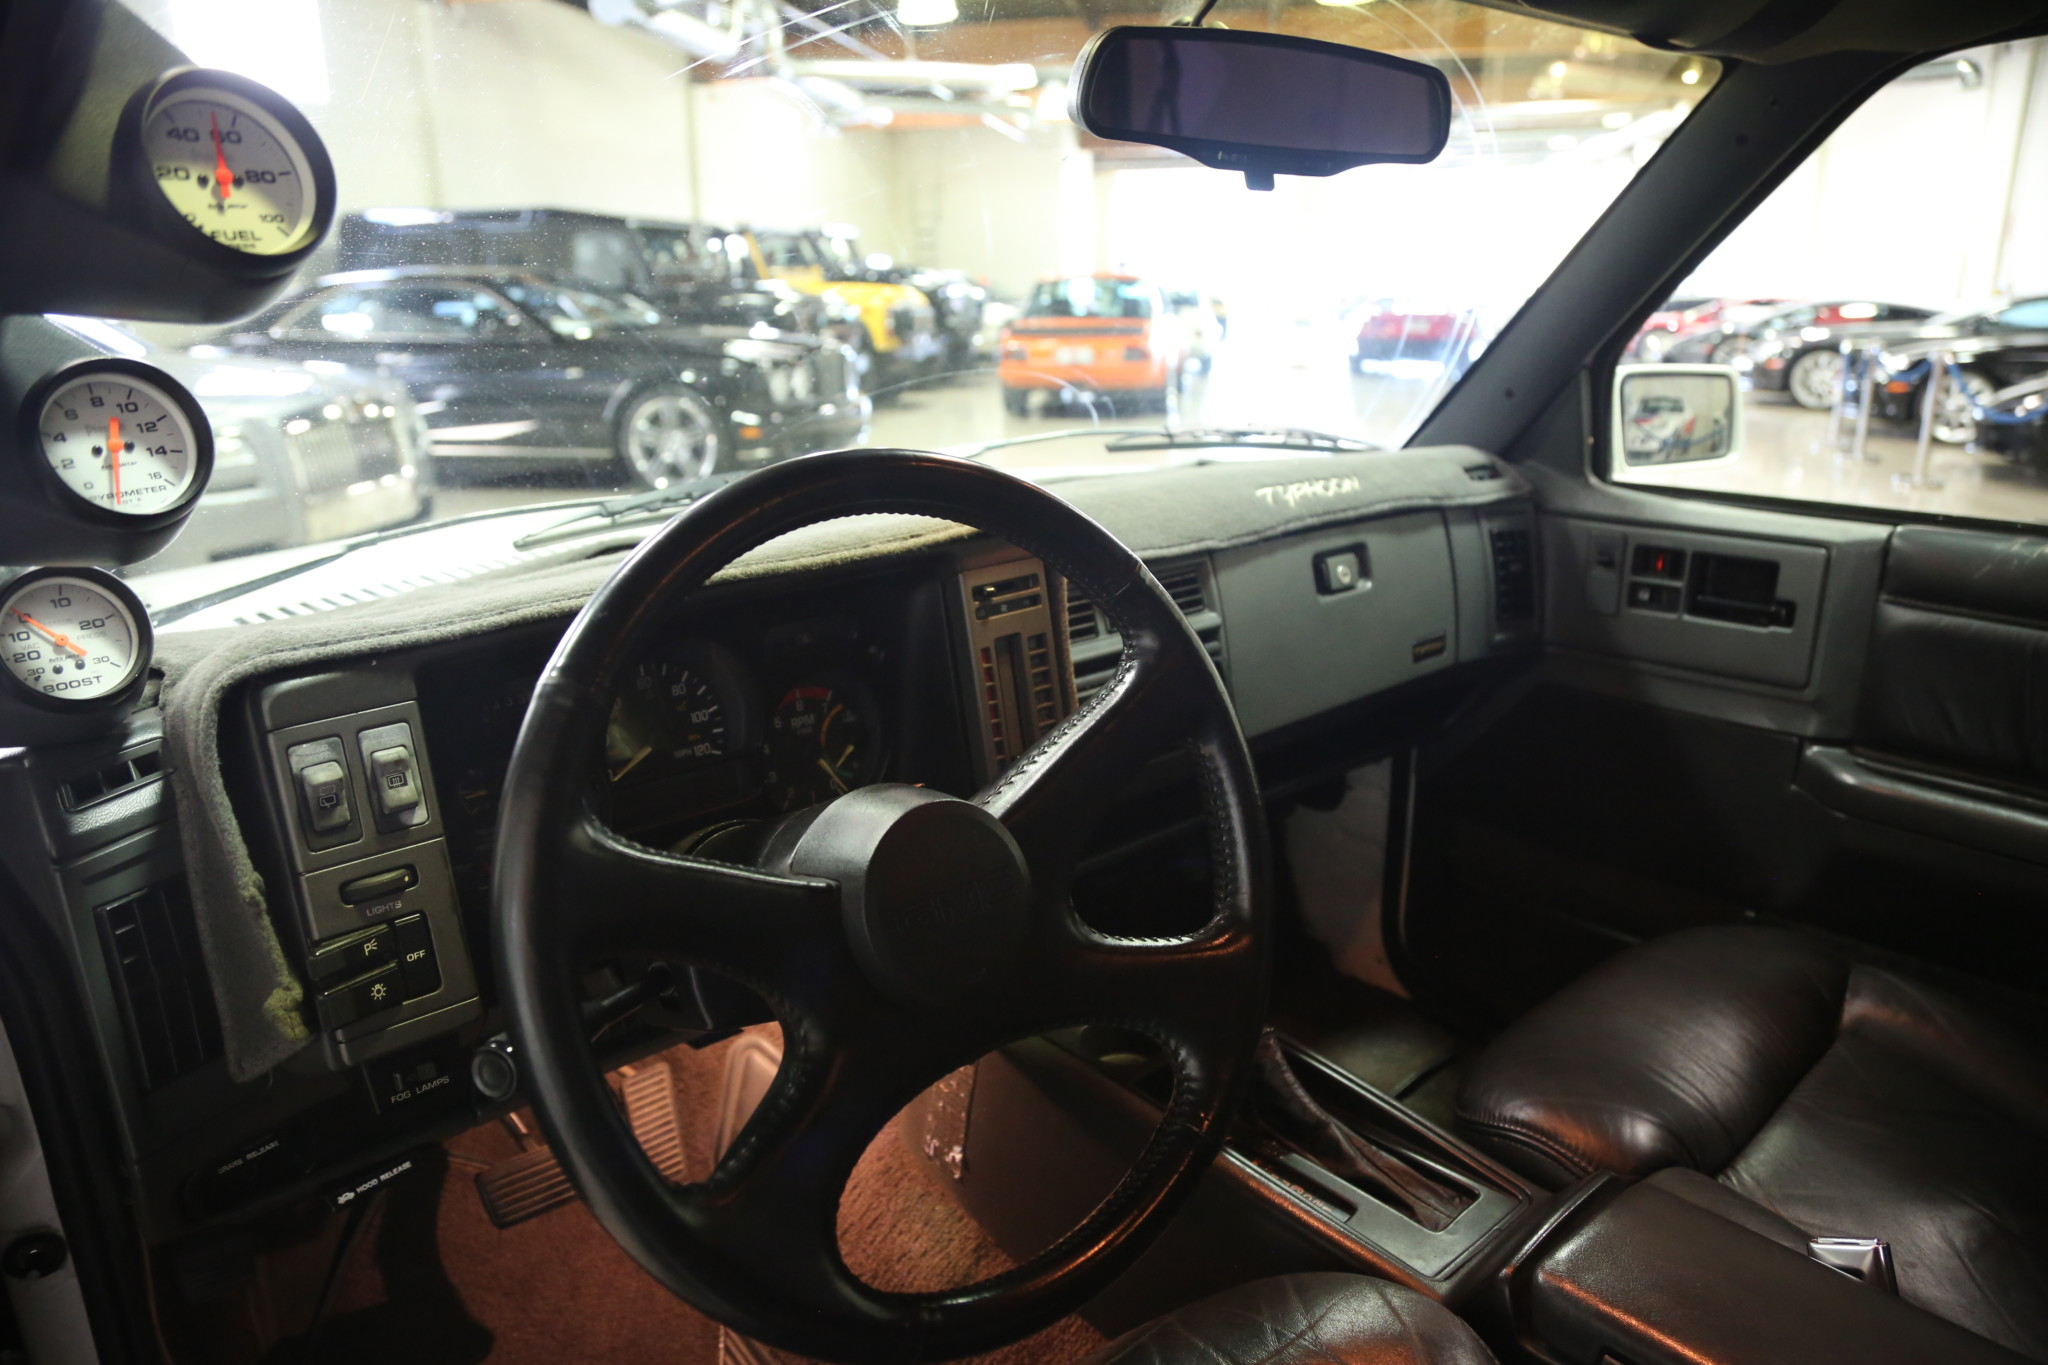 1993 GMC Typhoon driver interior